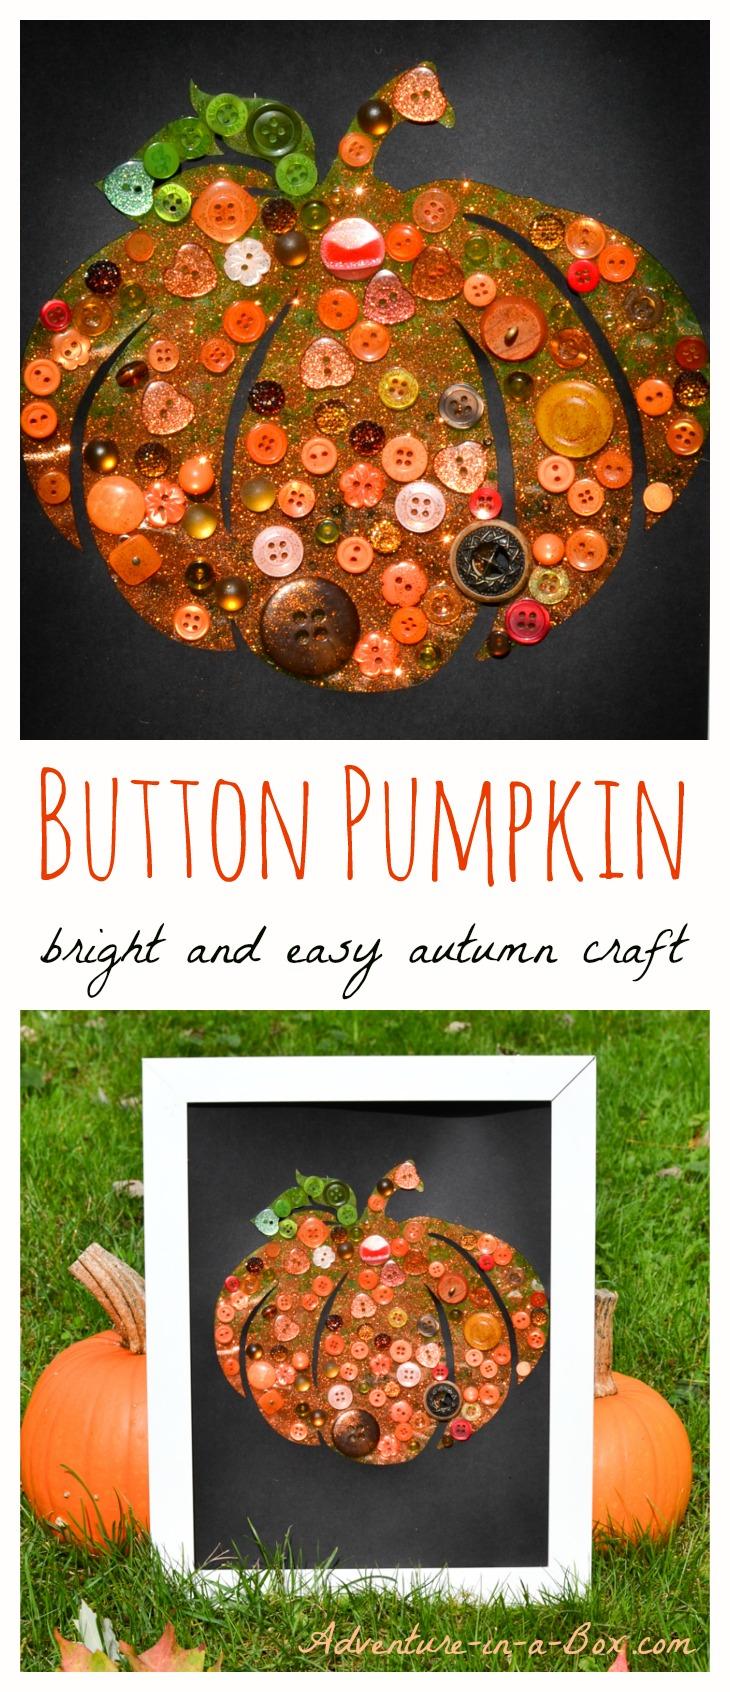 Button Pumpkin: Bright and Easy Autumn Craft